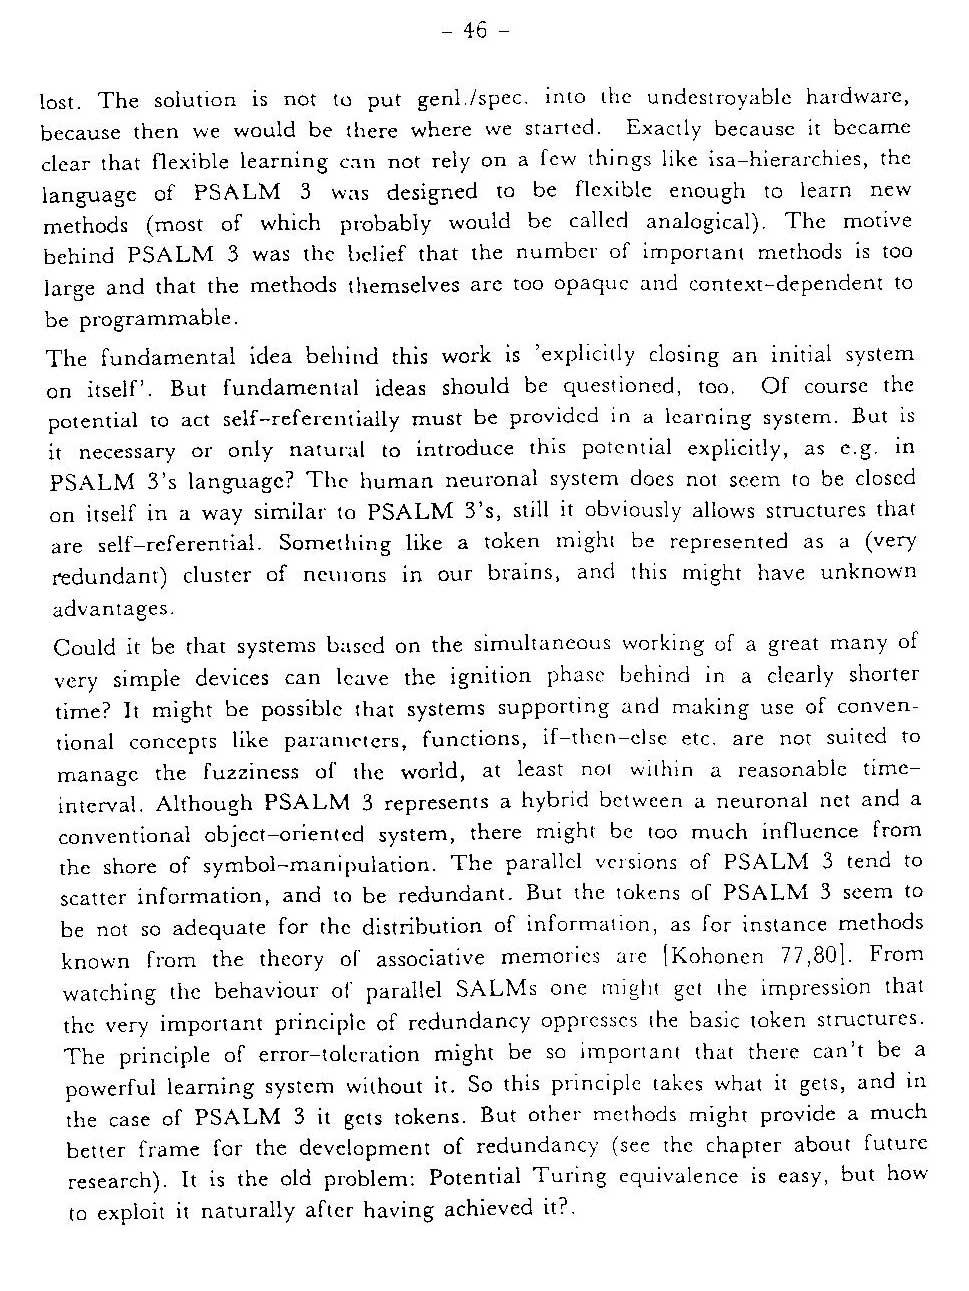 1987 THESIS ON LEARNING LEARN, METALEARNING, META GENETIC ...